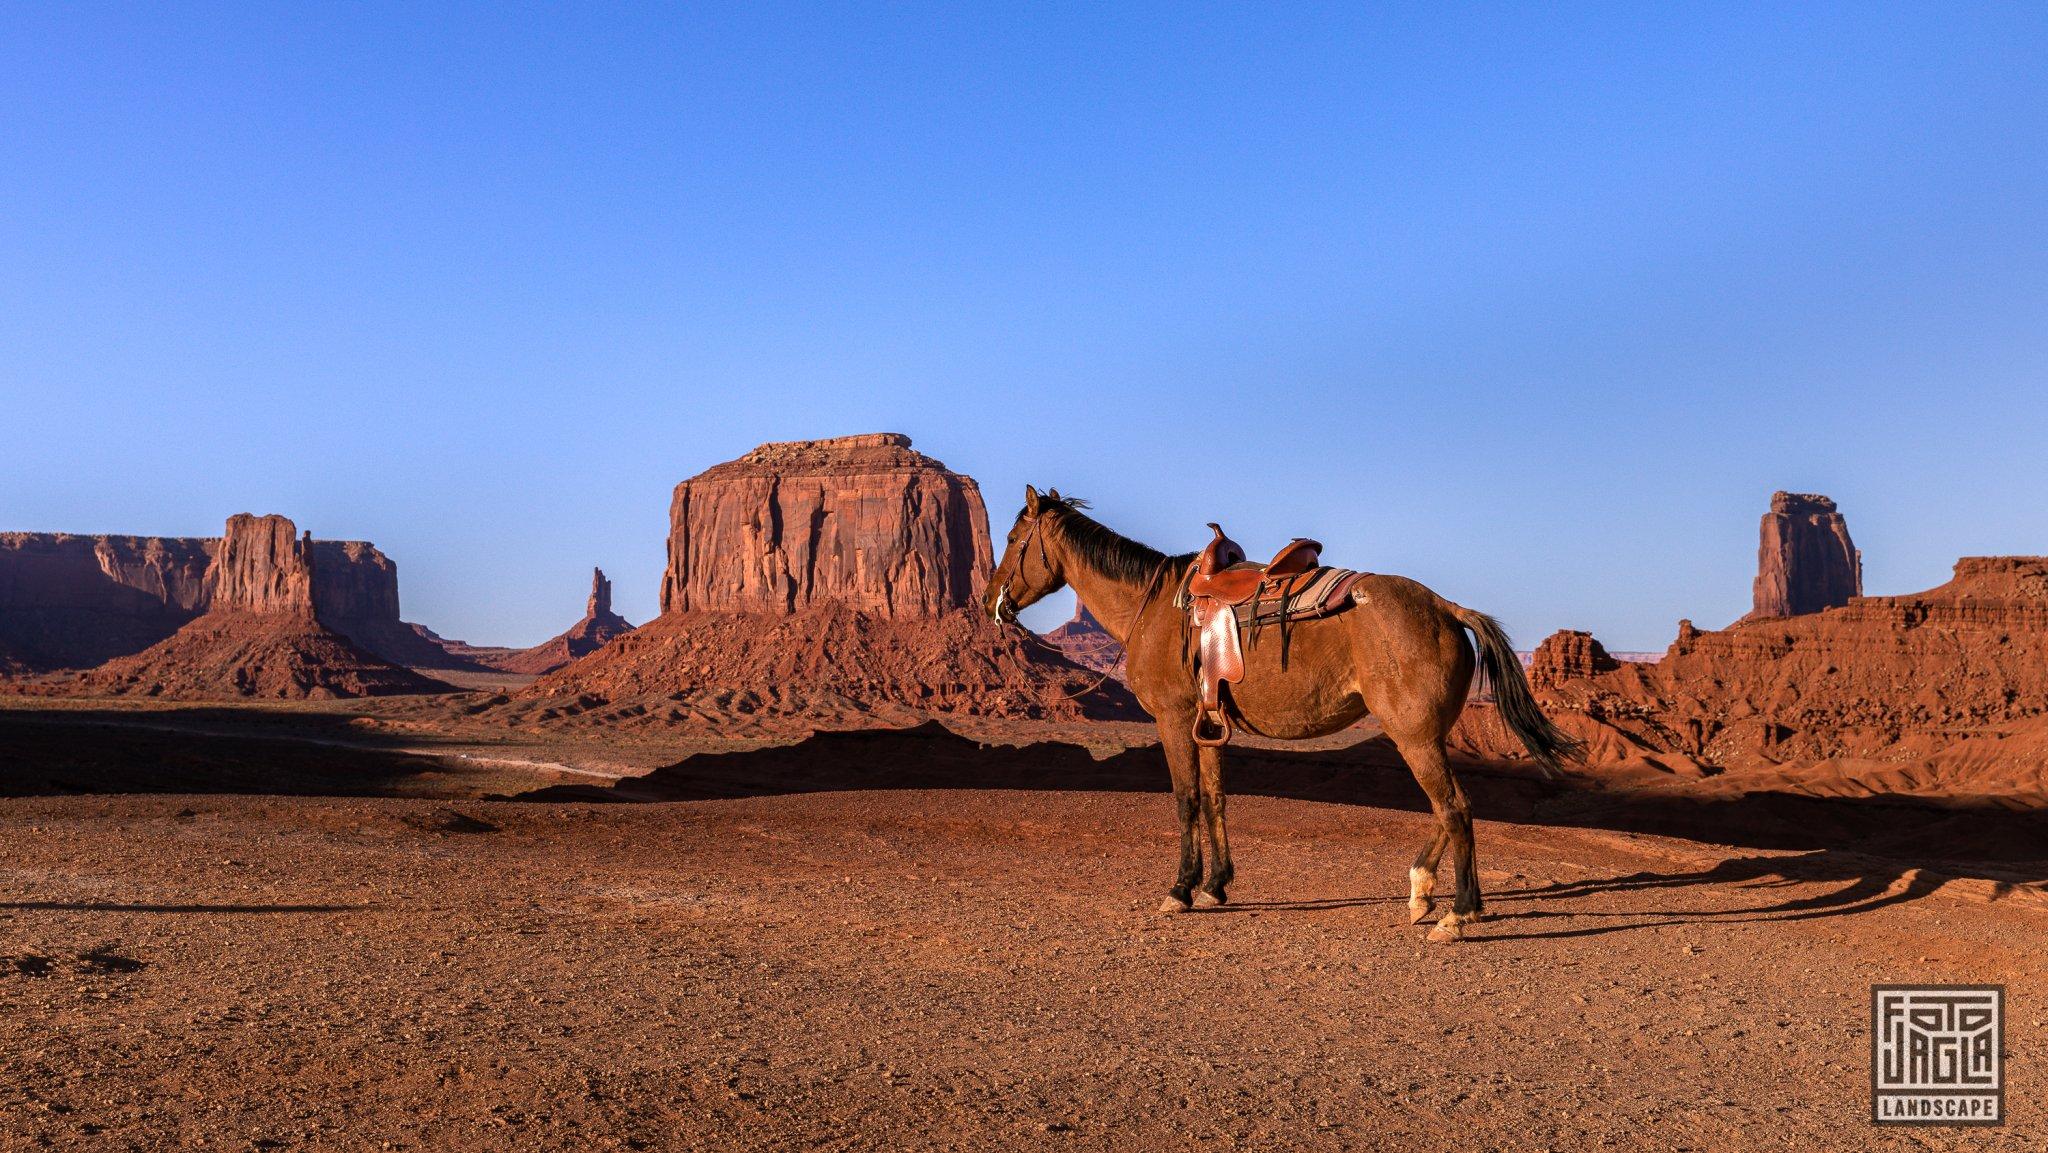 Horse at Monument Valley Arizona, USA 2019